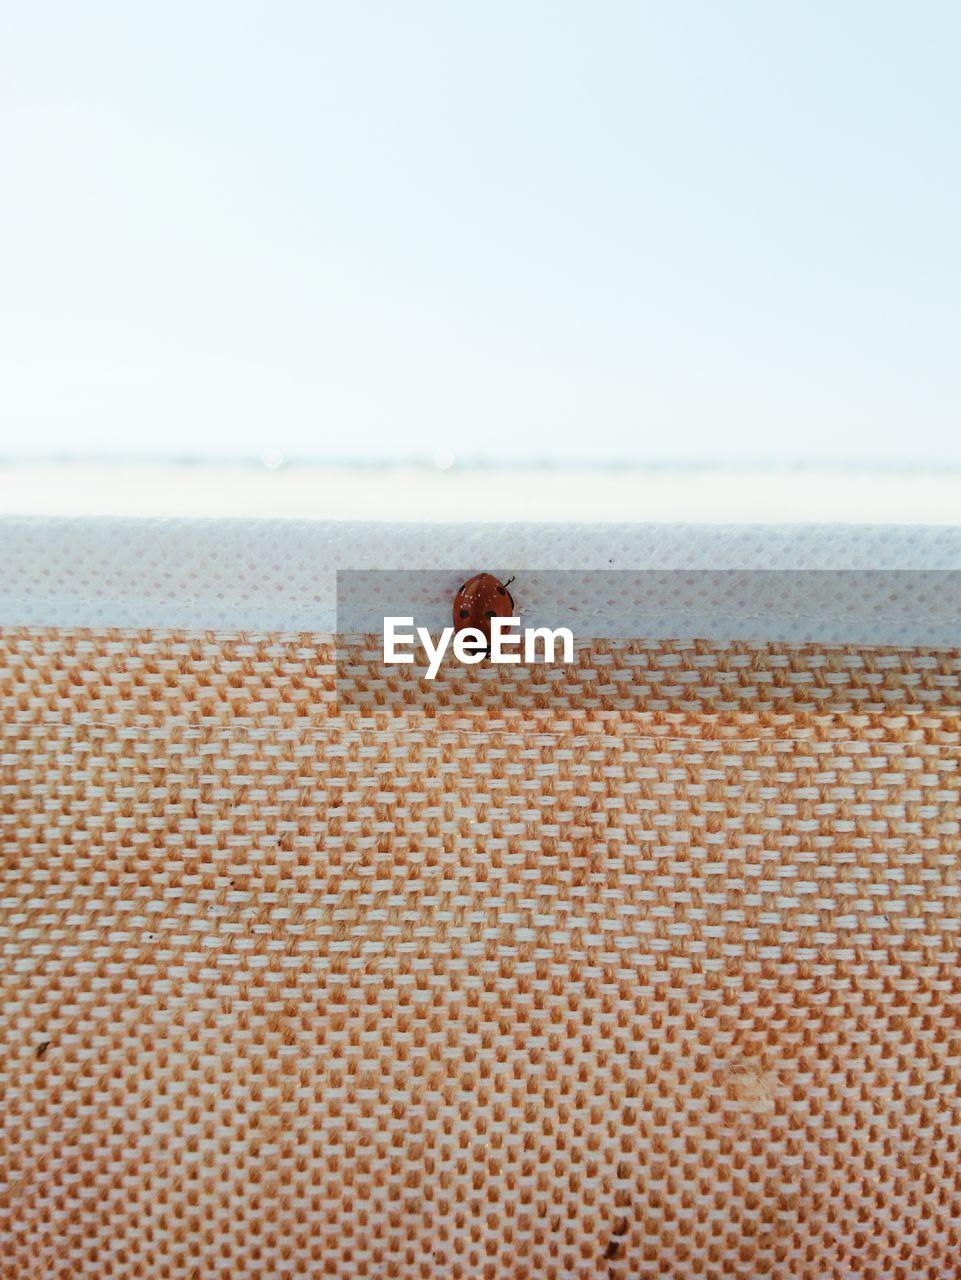 Ladybug On Textile